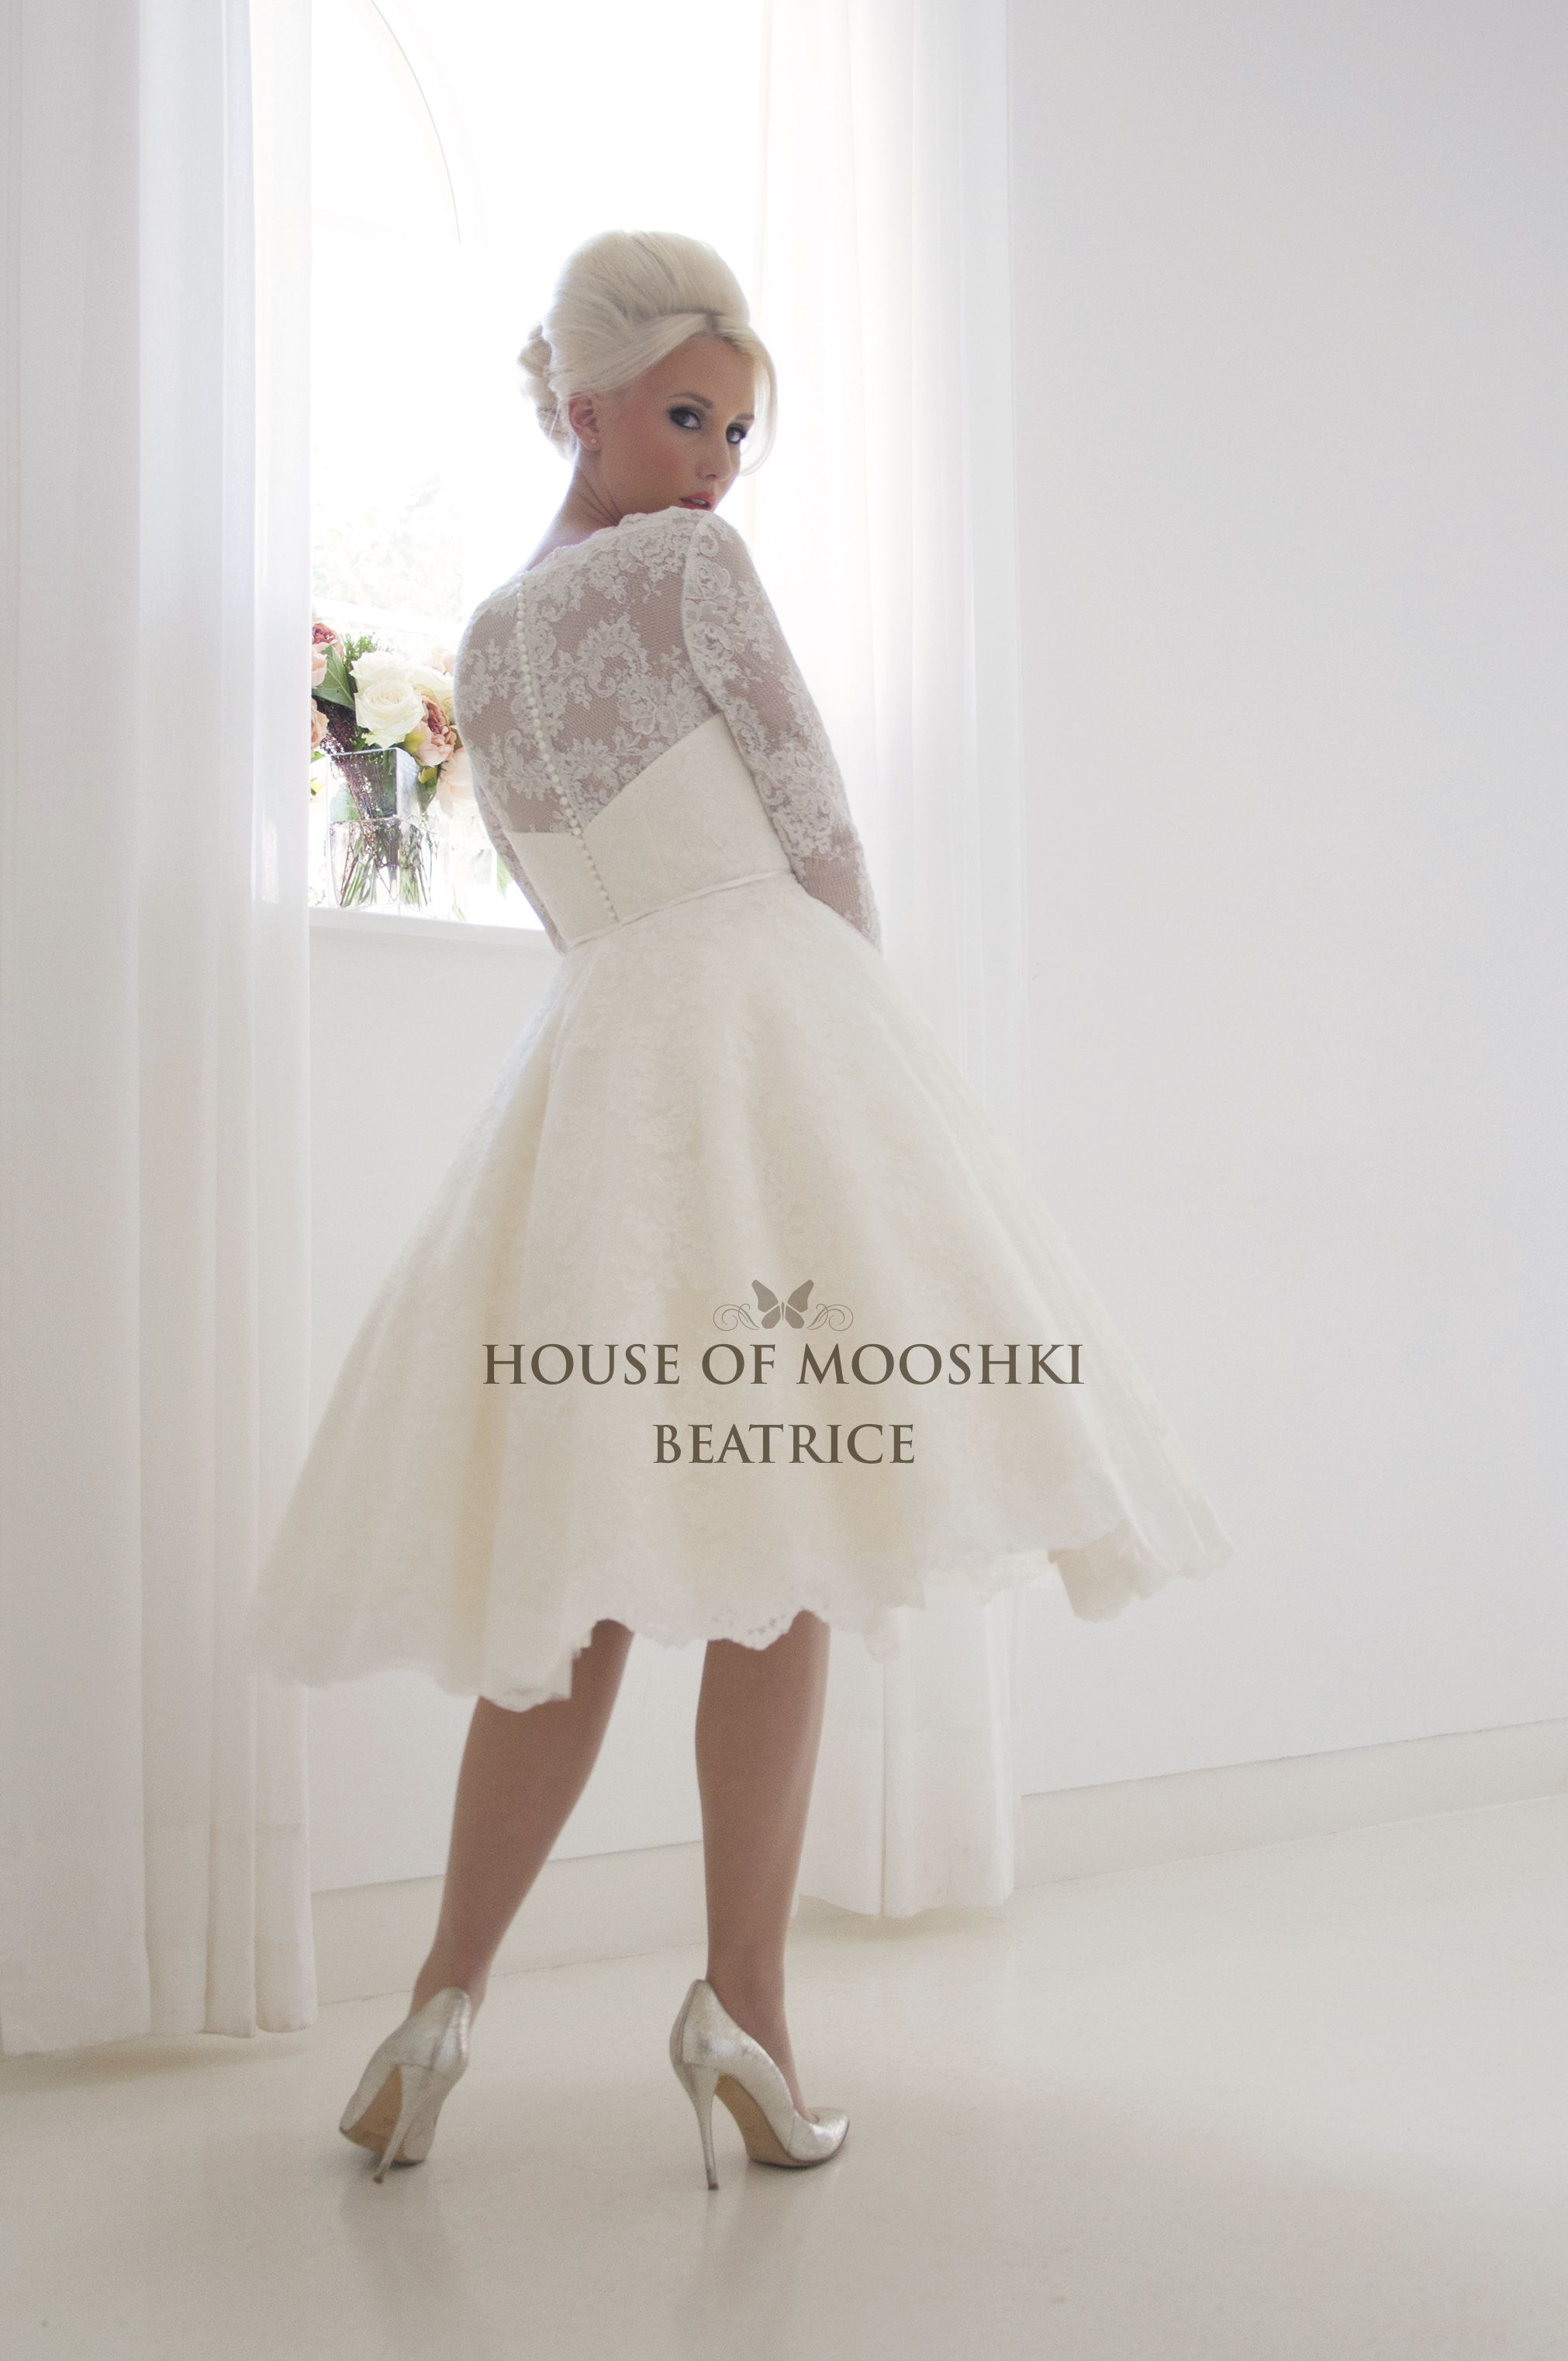 Beatrice Short Vintage 1960 S Full French Lace Tea Length Wedding Dress A Shorter Knee Length Wedding Dress Short Bridal Gown Long Sleeve Wedding Dress Lace [ 3044 x 2022 Pixel ]